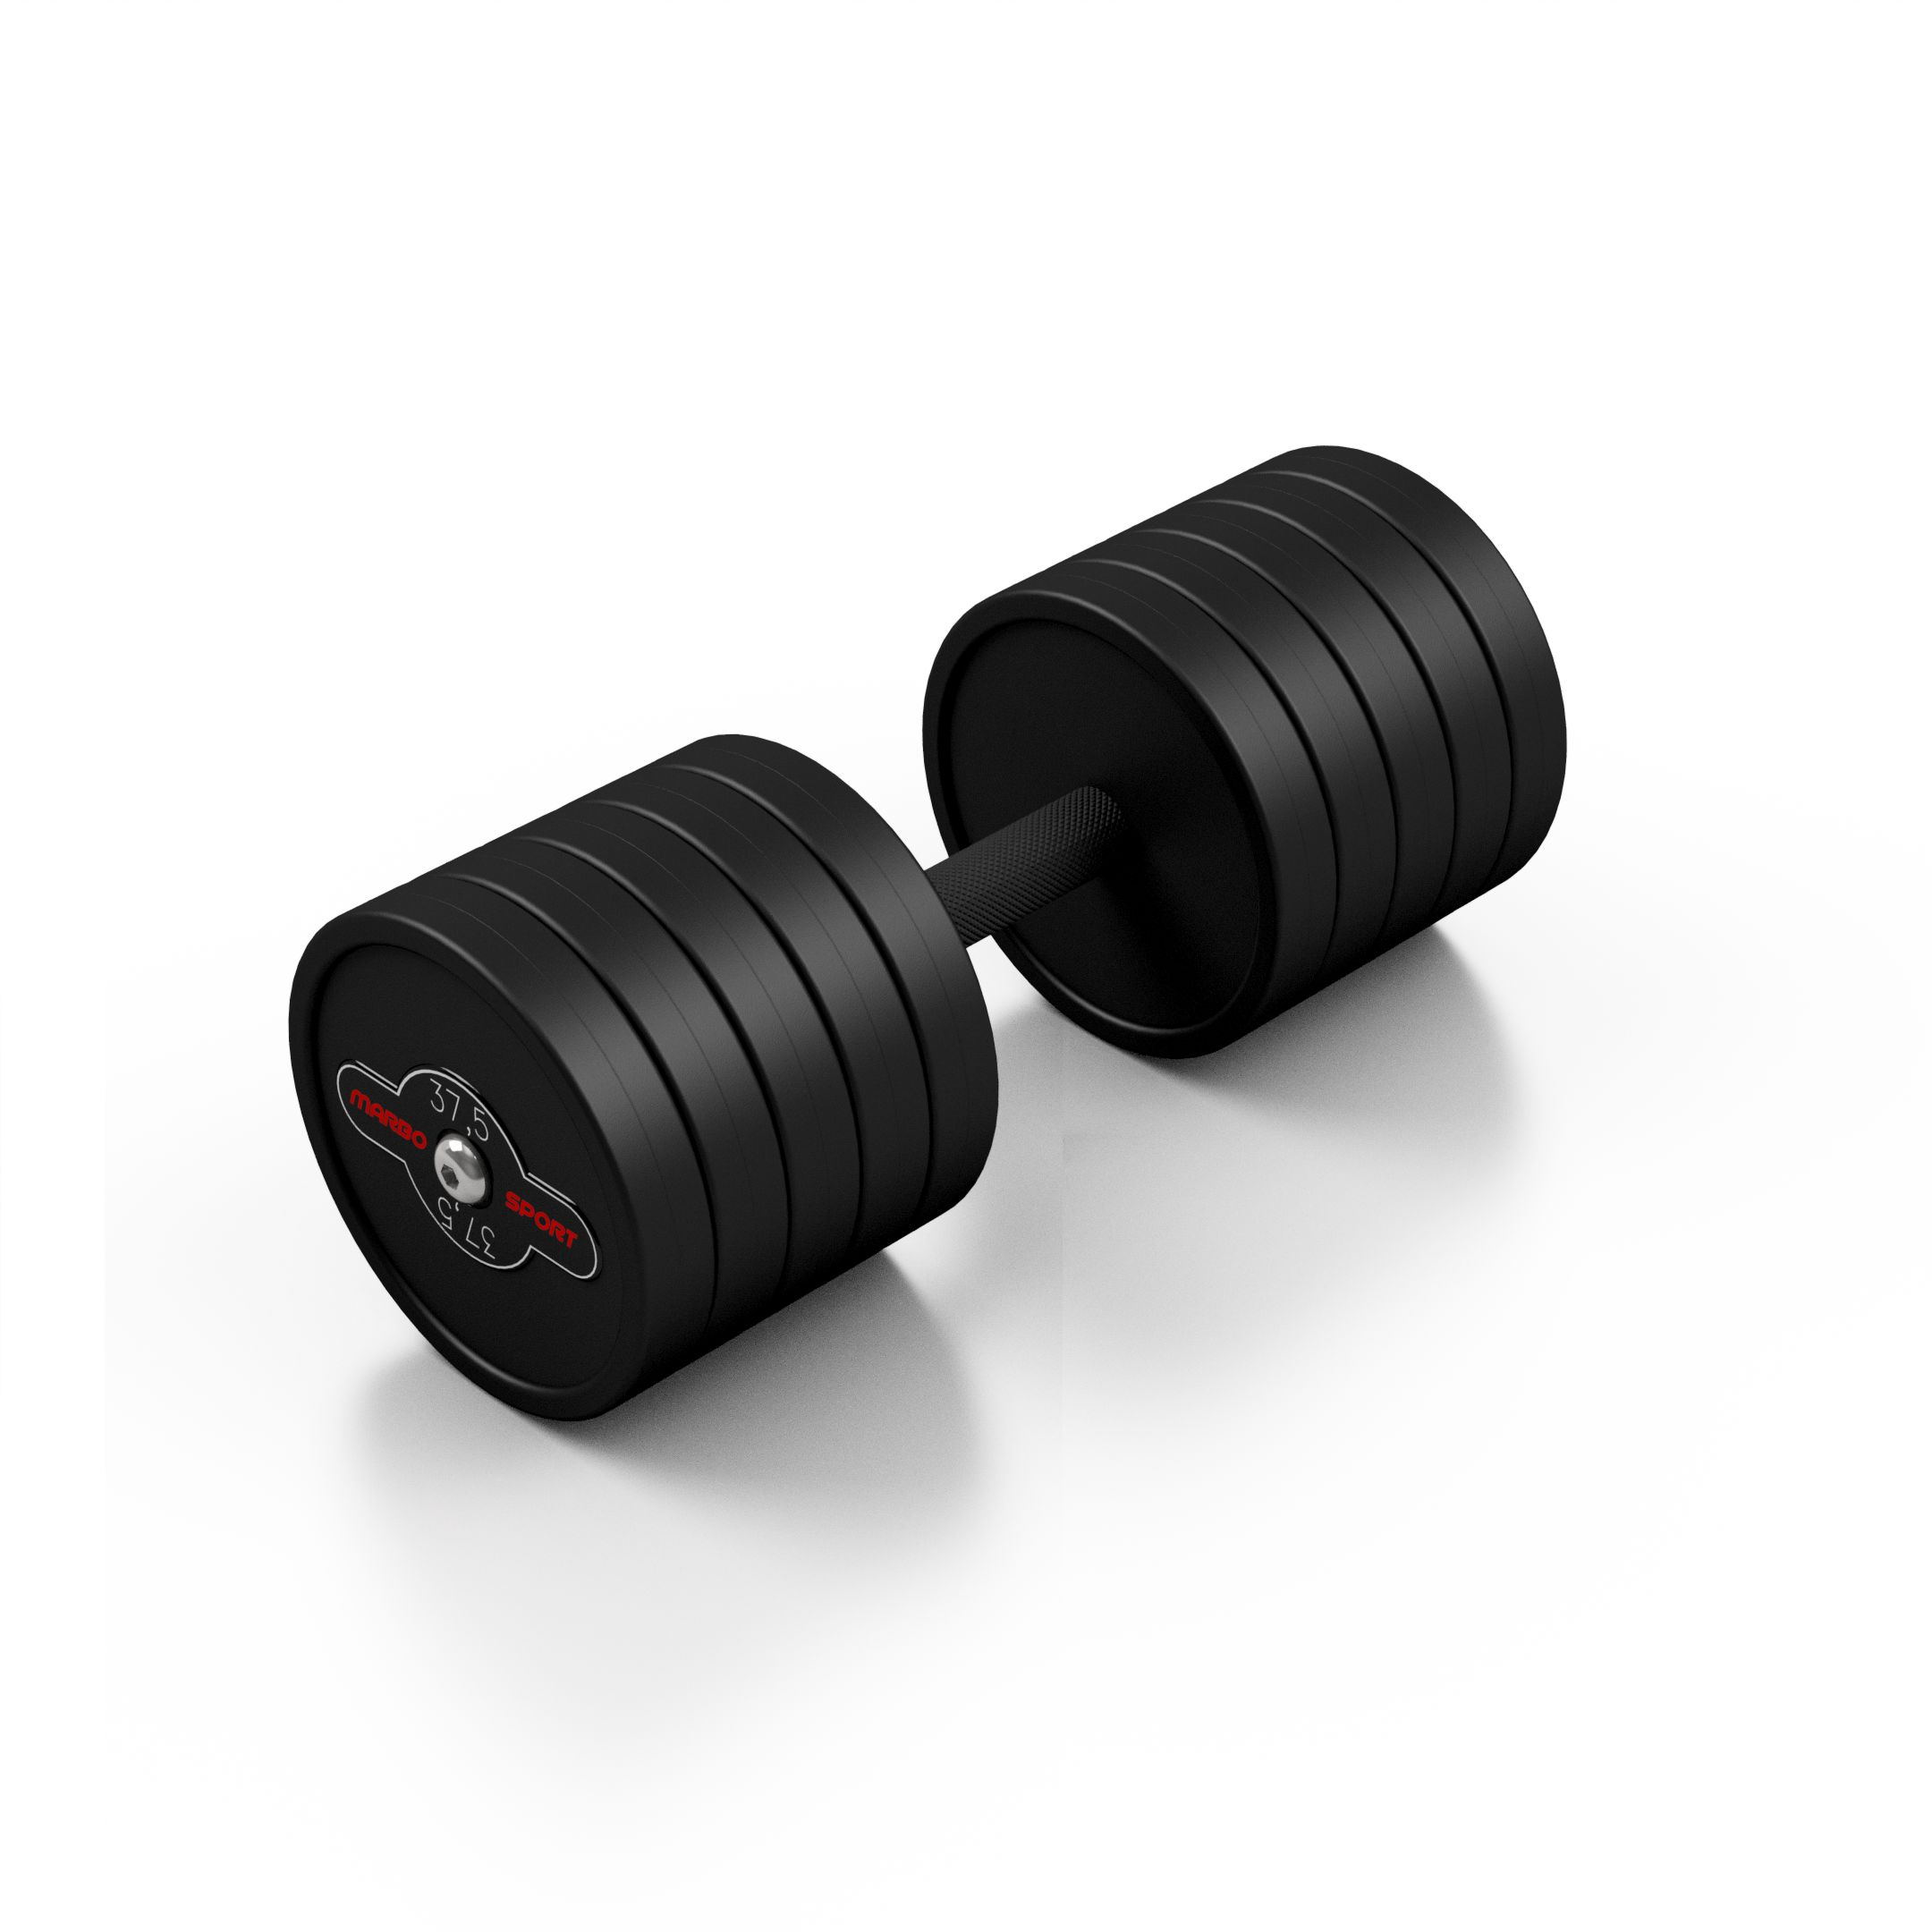 Hantla stalowa gumowana 37,5 kg czarny mat - Marbo Sport - 37,5 kg